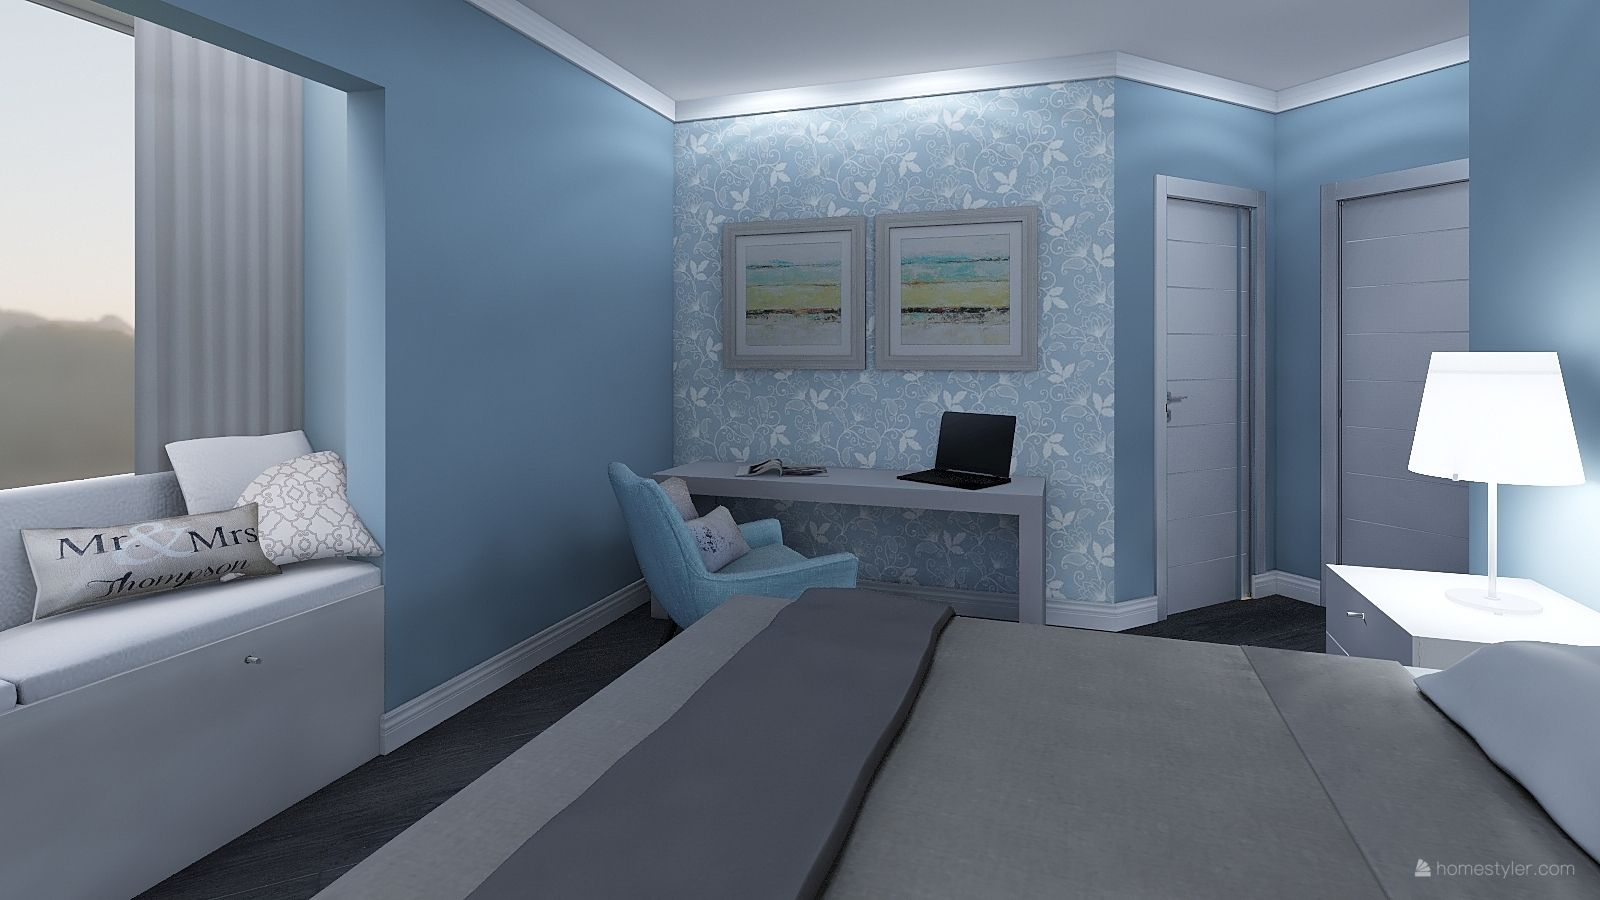 Bedroom Design By Chris M Interiordesign Bedroomdecor Online Home Design Home Design Software 3d Home Design Software Bedroom design online 3d